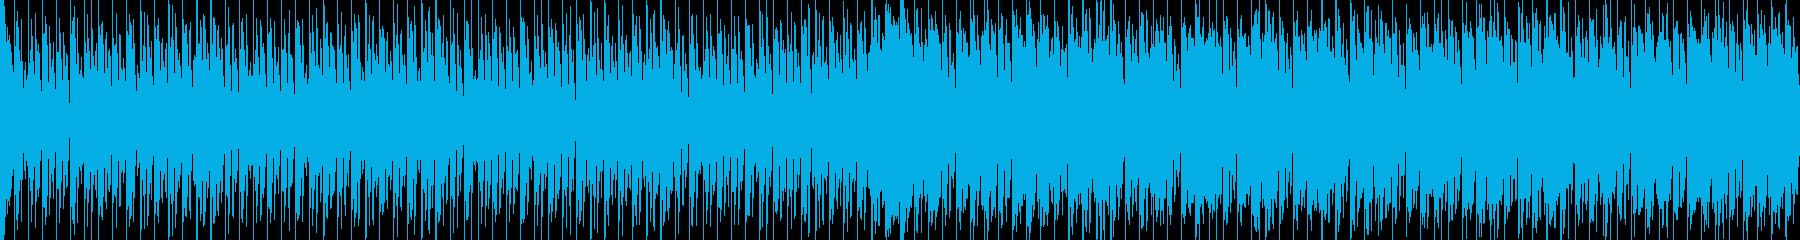 EDMクラブ系ダンスミュージック-126の再生済みの波形